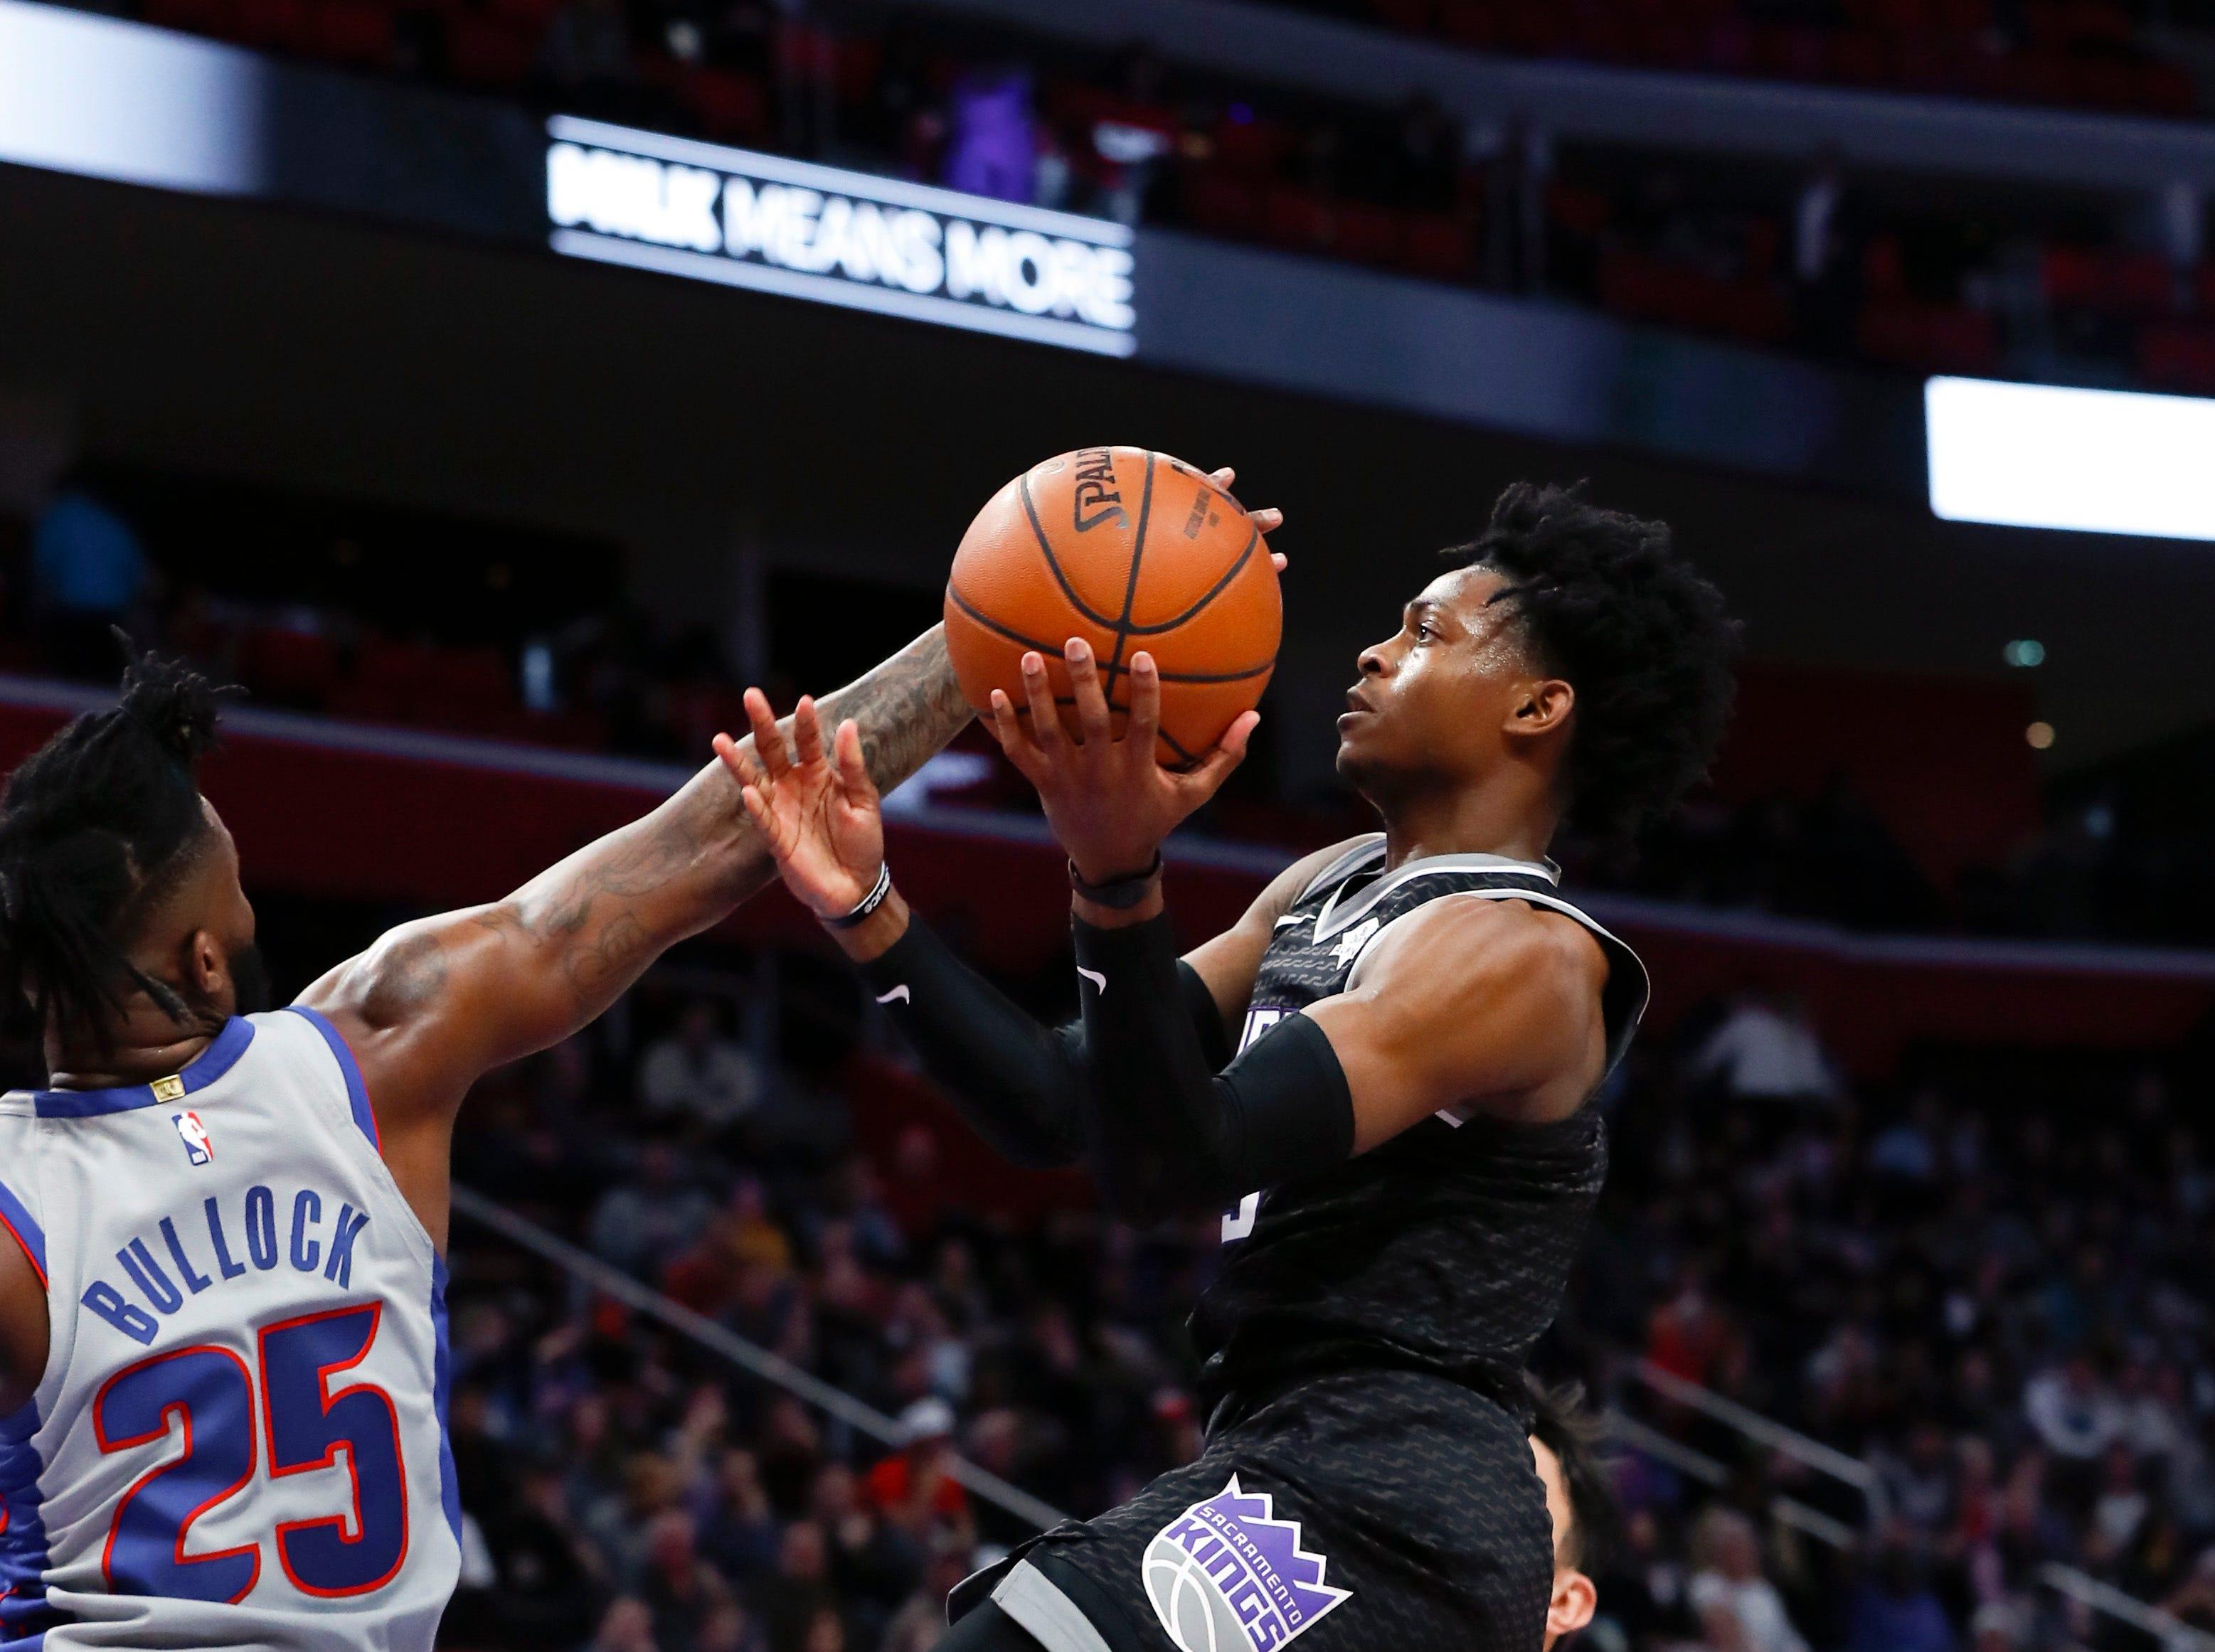 Sacramento Kings guard De'Aaron Fox (5) drives on Detroit Pistons guard Reggie Bullock (25) during the second half of an NBA basketball game in Detroit, Saturday, Jan. 19, 2019.